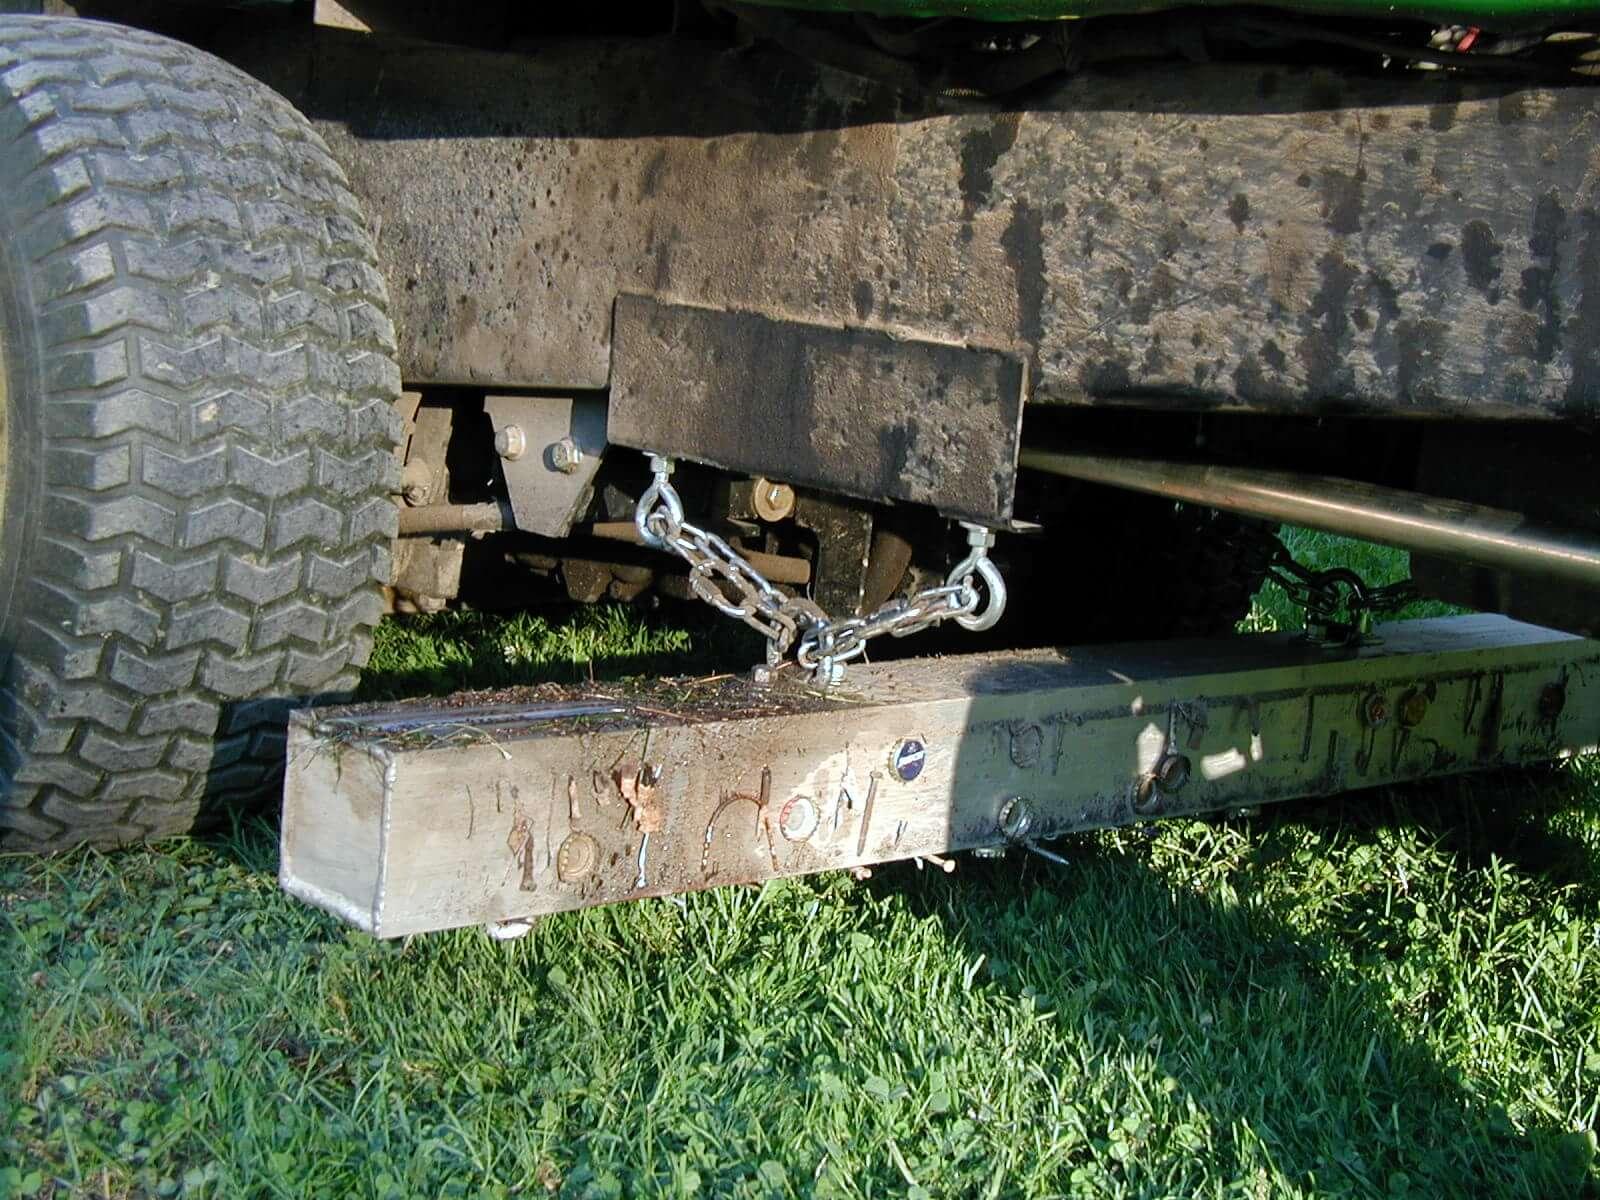 wrasse-magnetic-sweeper-grass-lawnmower-bluestreak-equipment